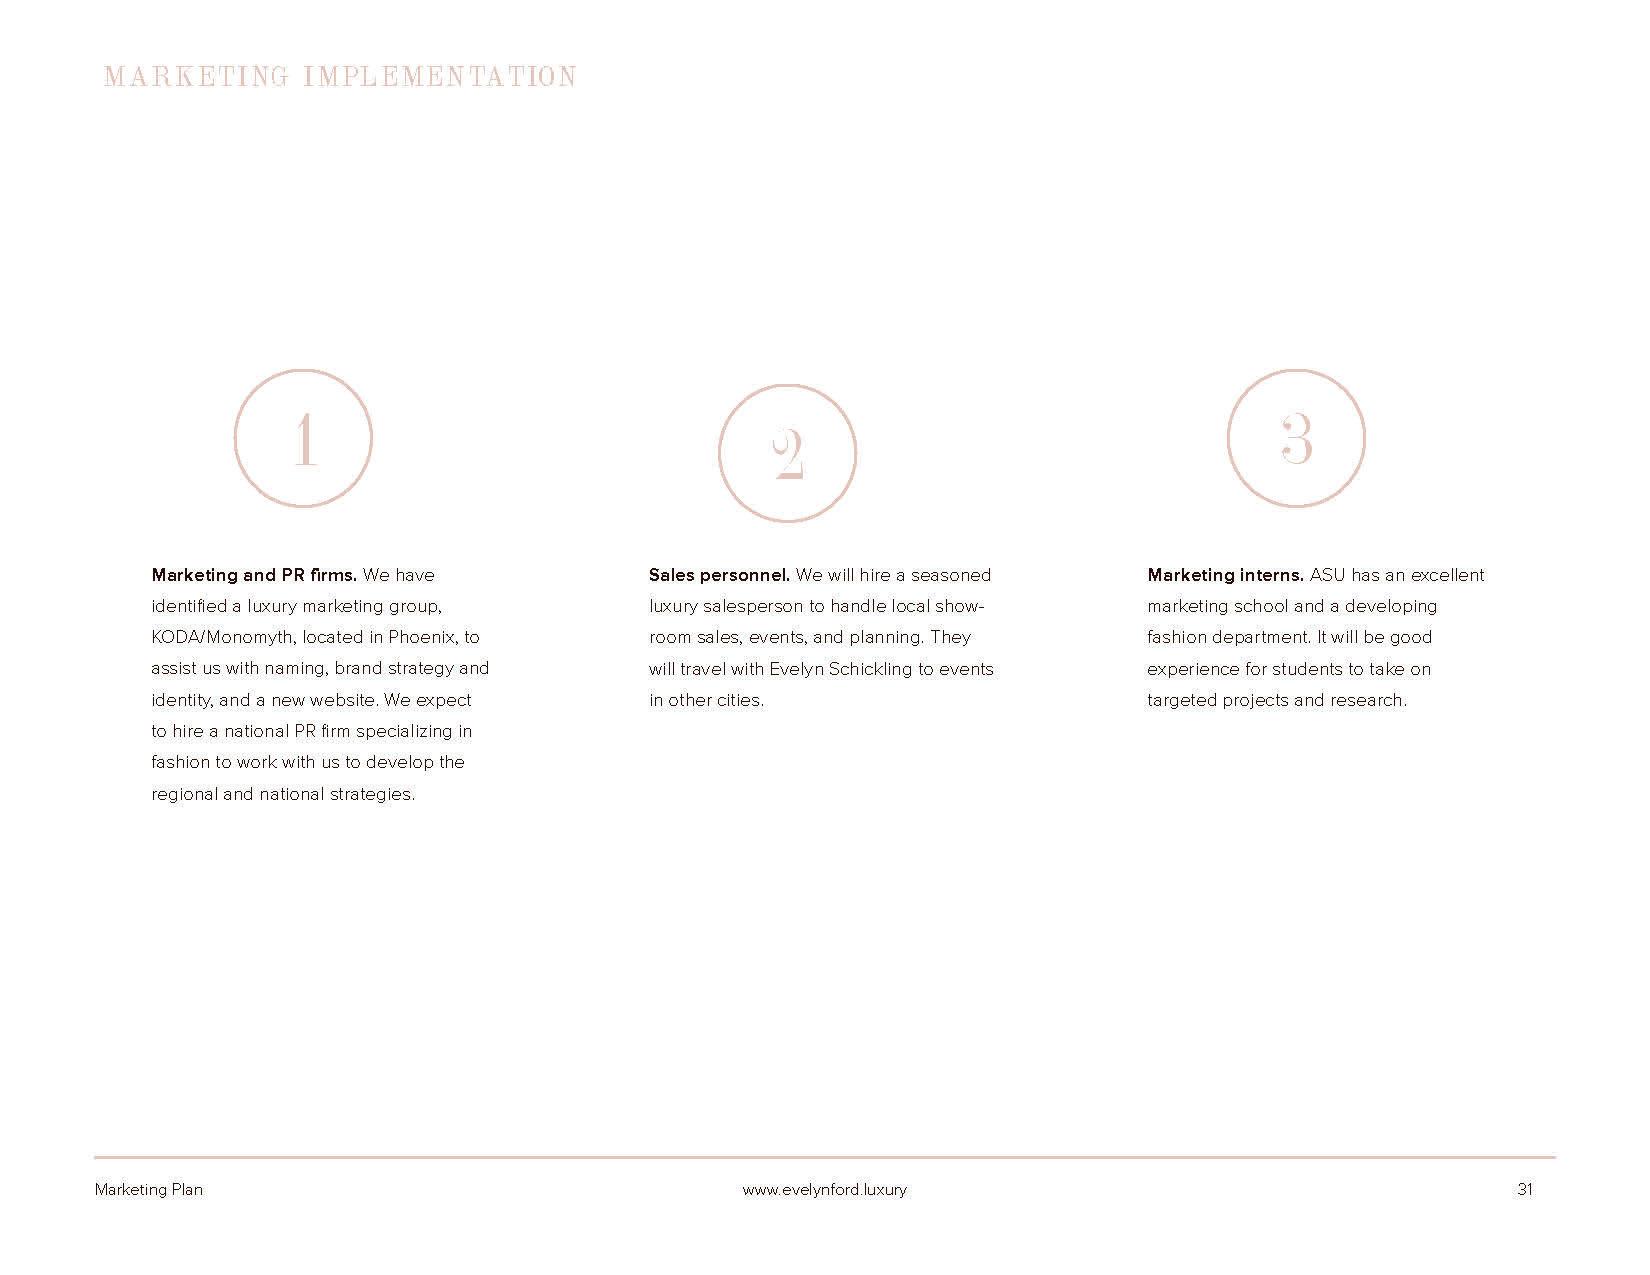 EFL_Marketing_Plan_110118_Page_31.jpg